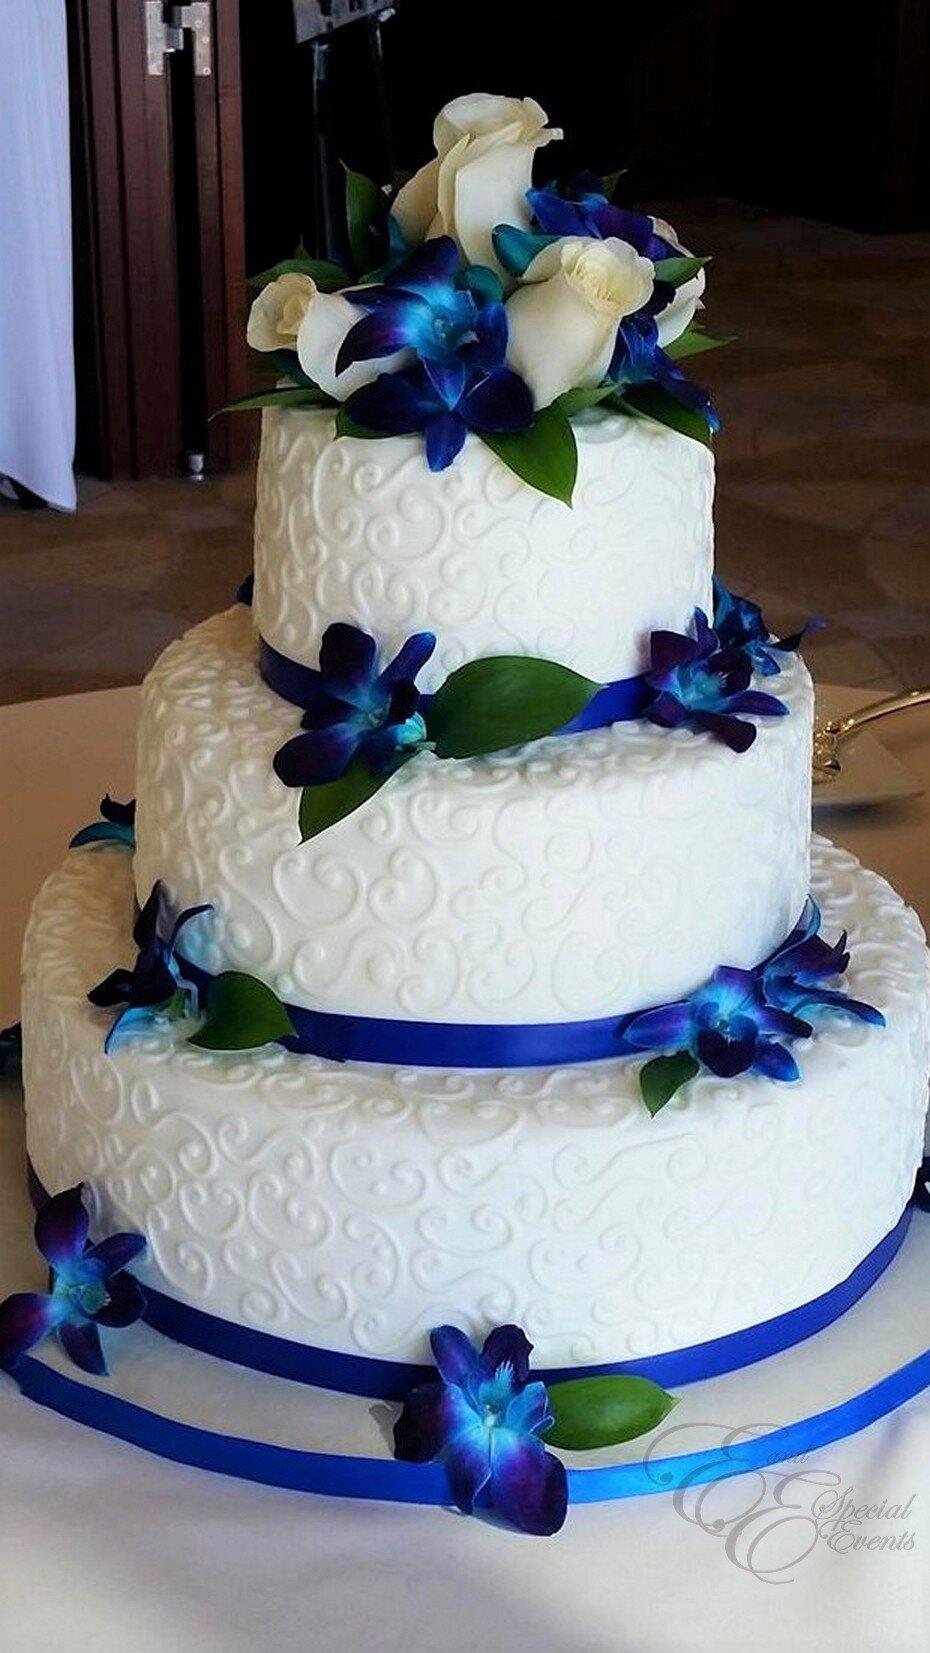 Blue orchid wedding cake.jpg